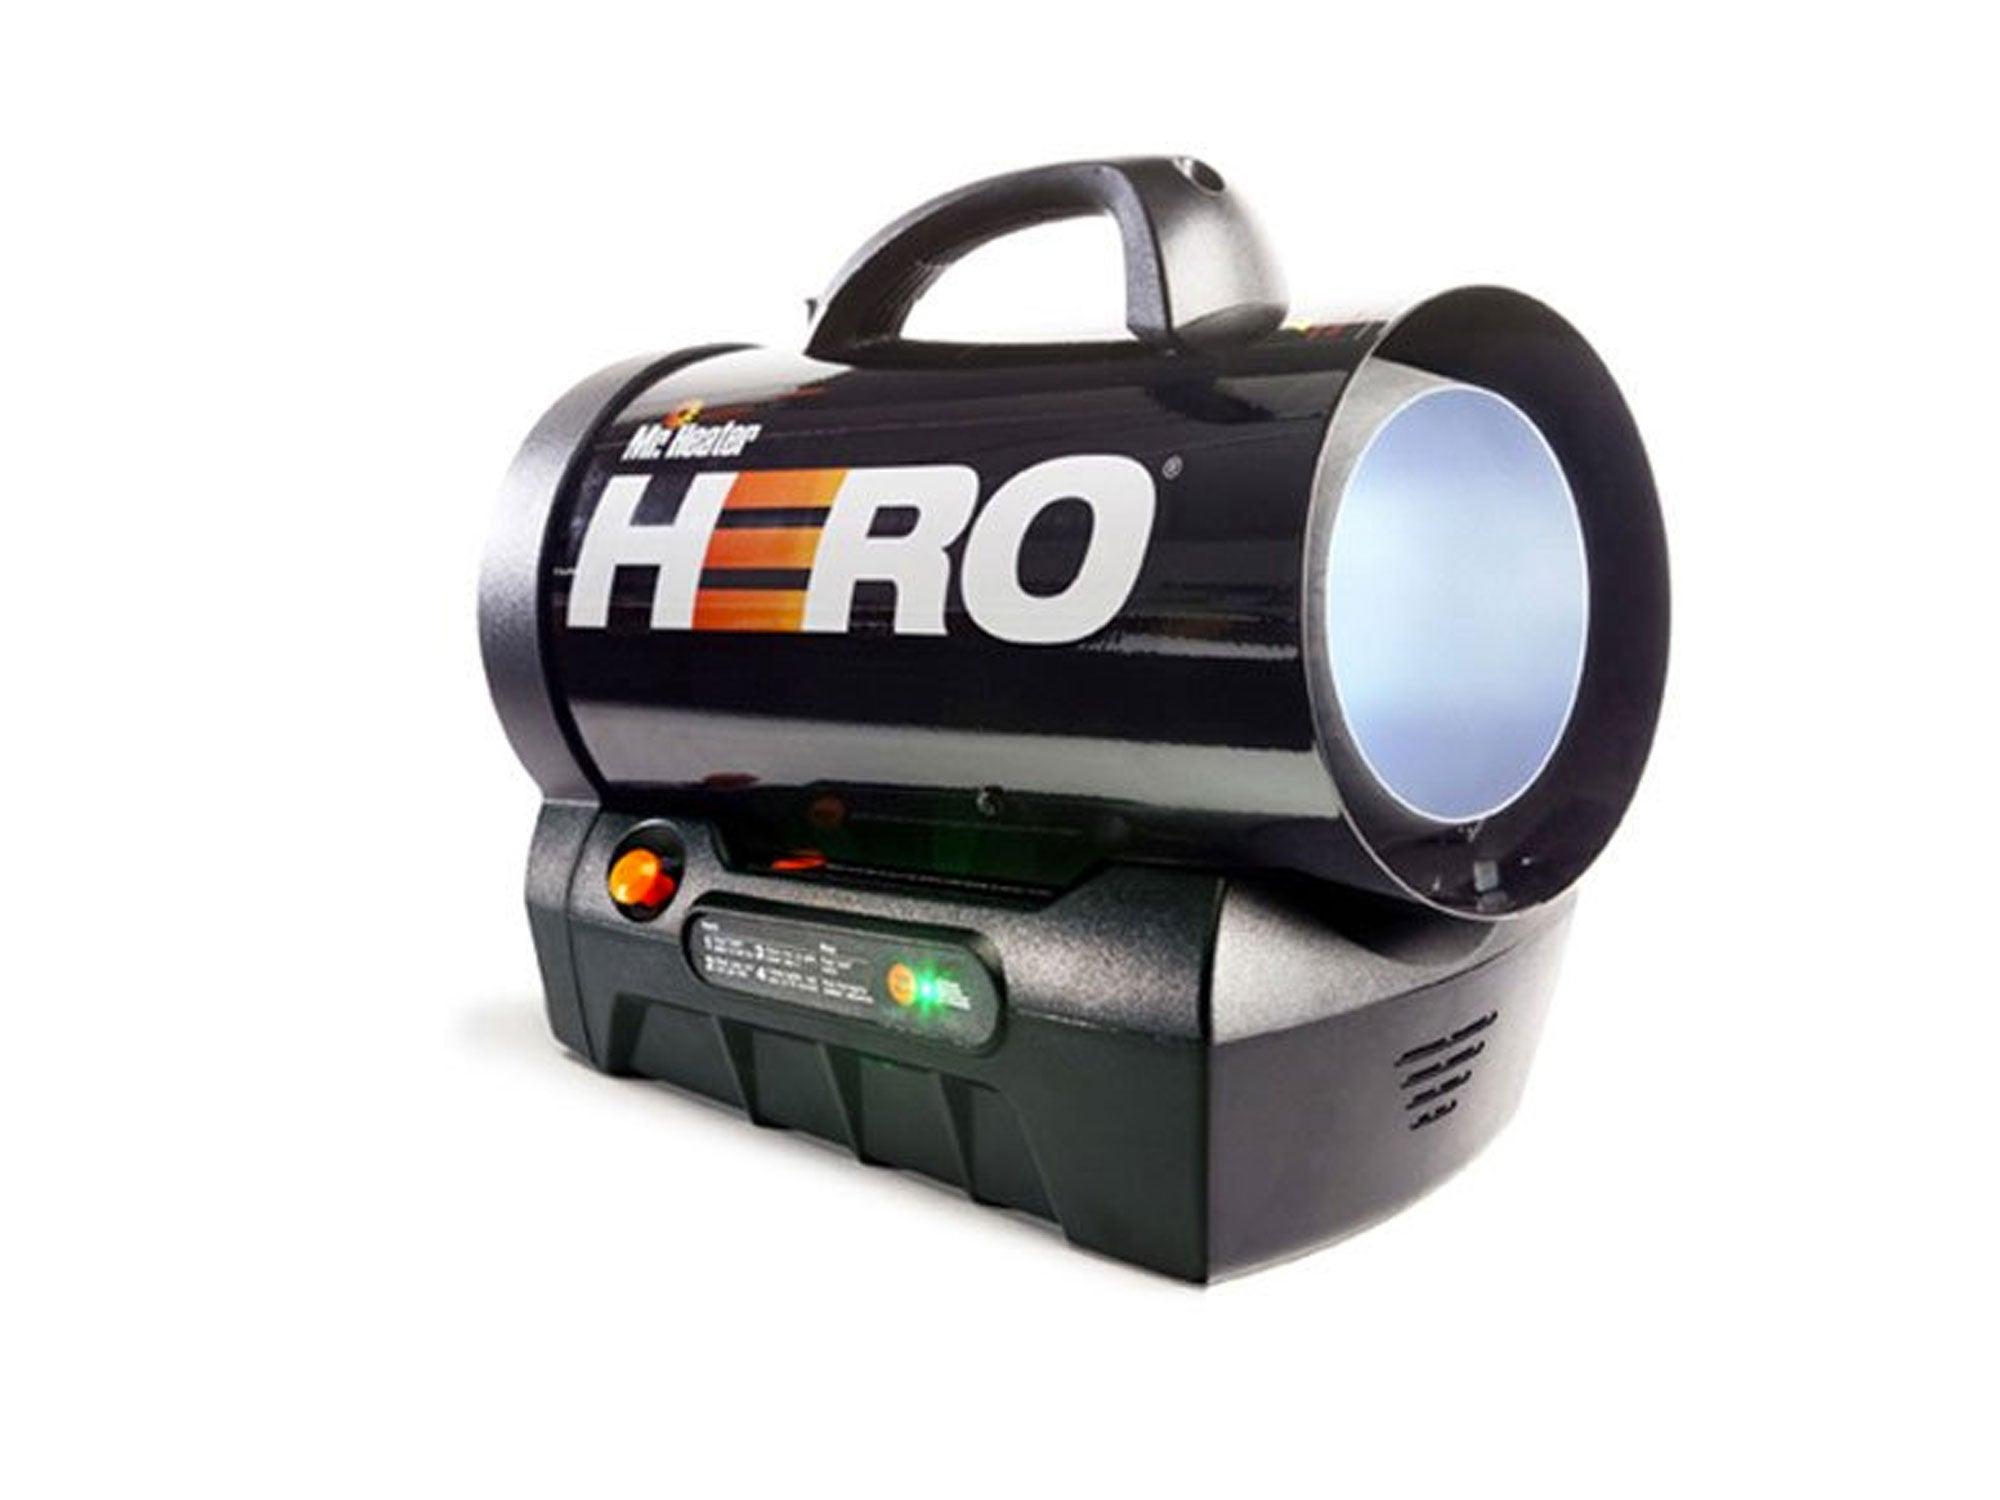 mr hero space heater